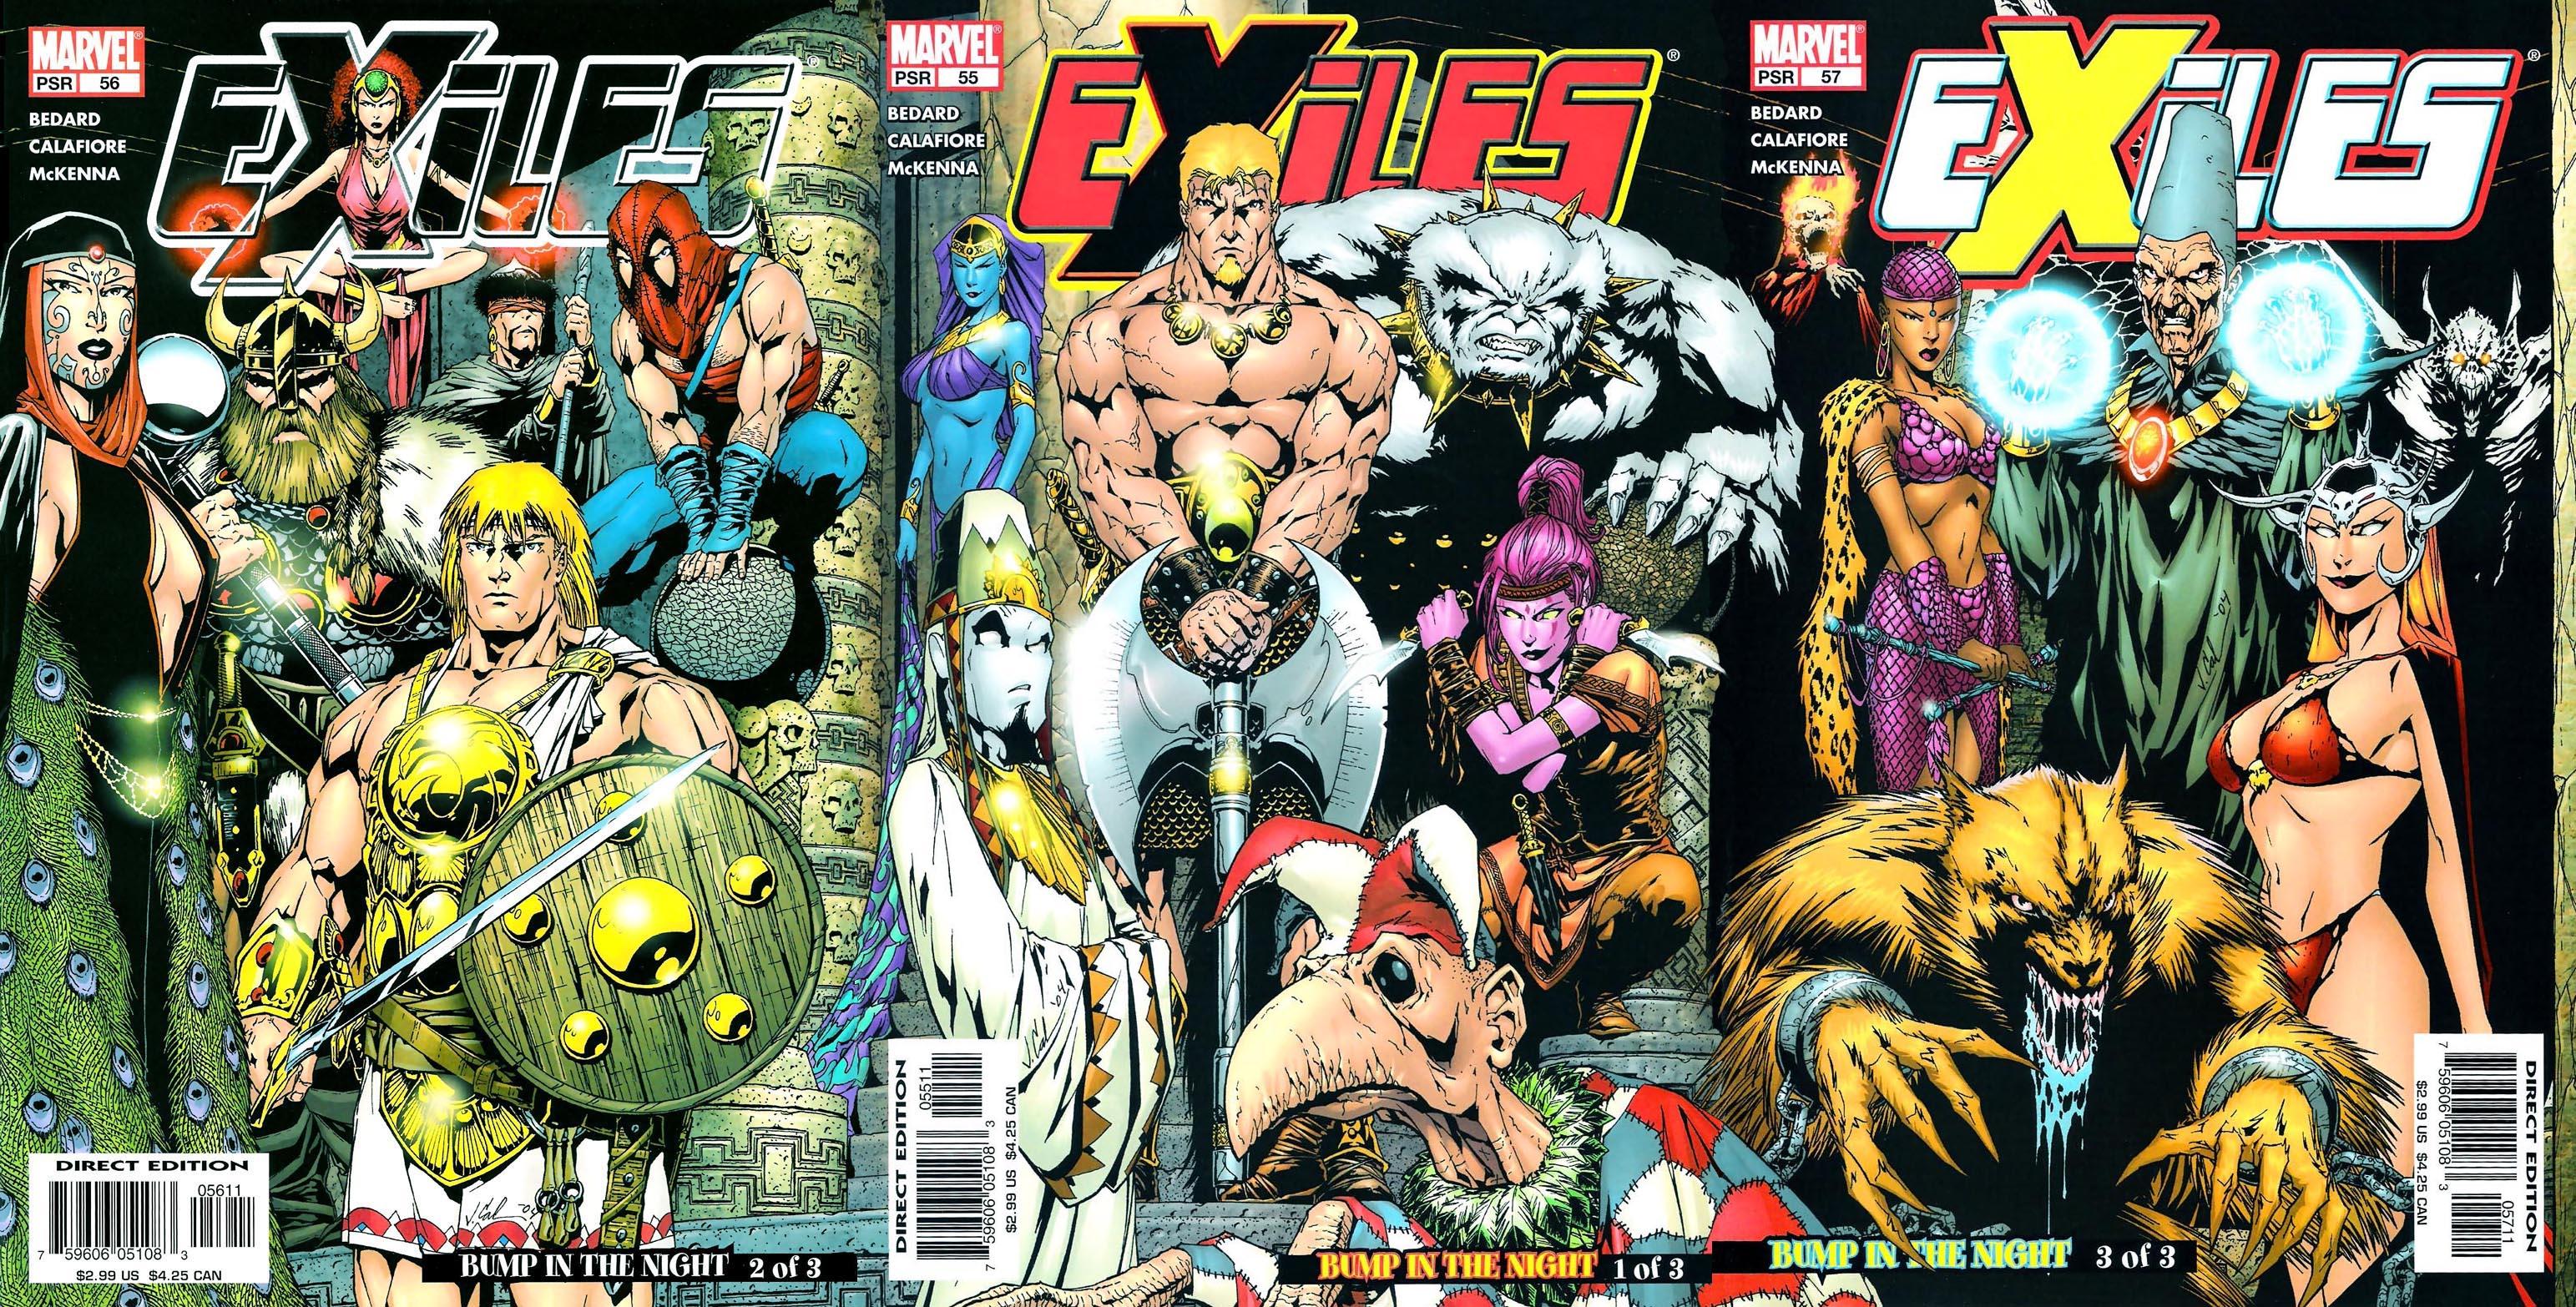 Exiles Vol 1 56 - Marvel Datab...